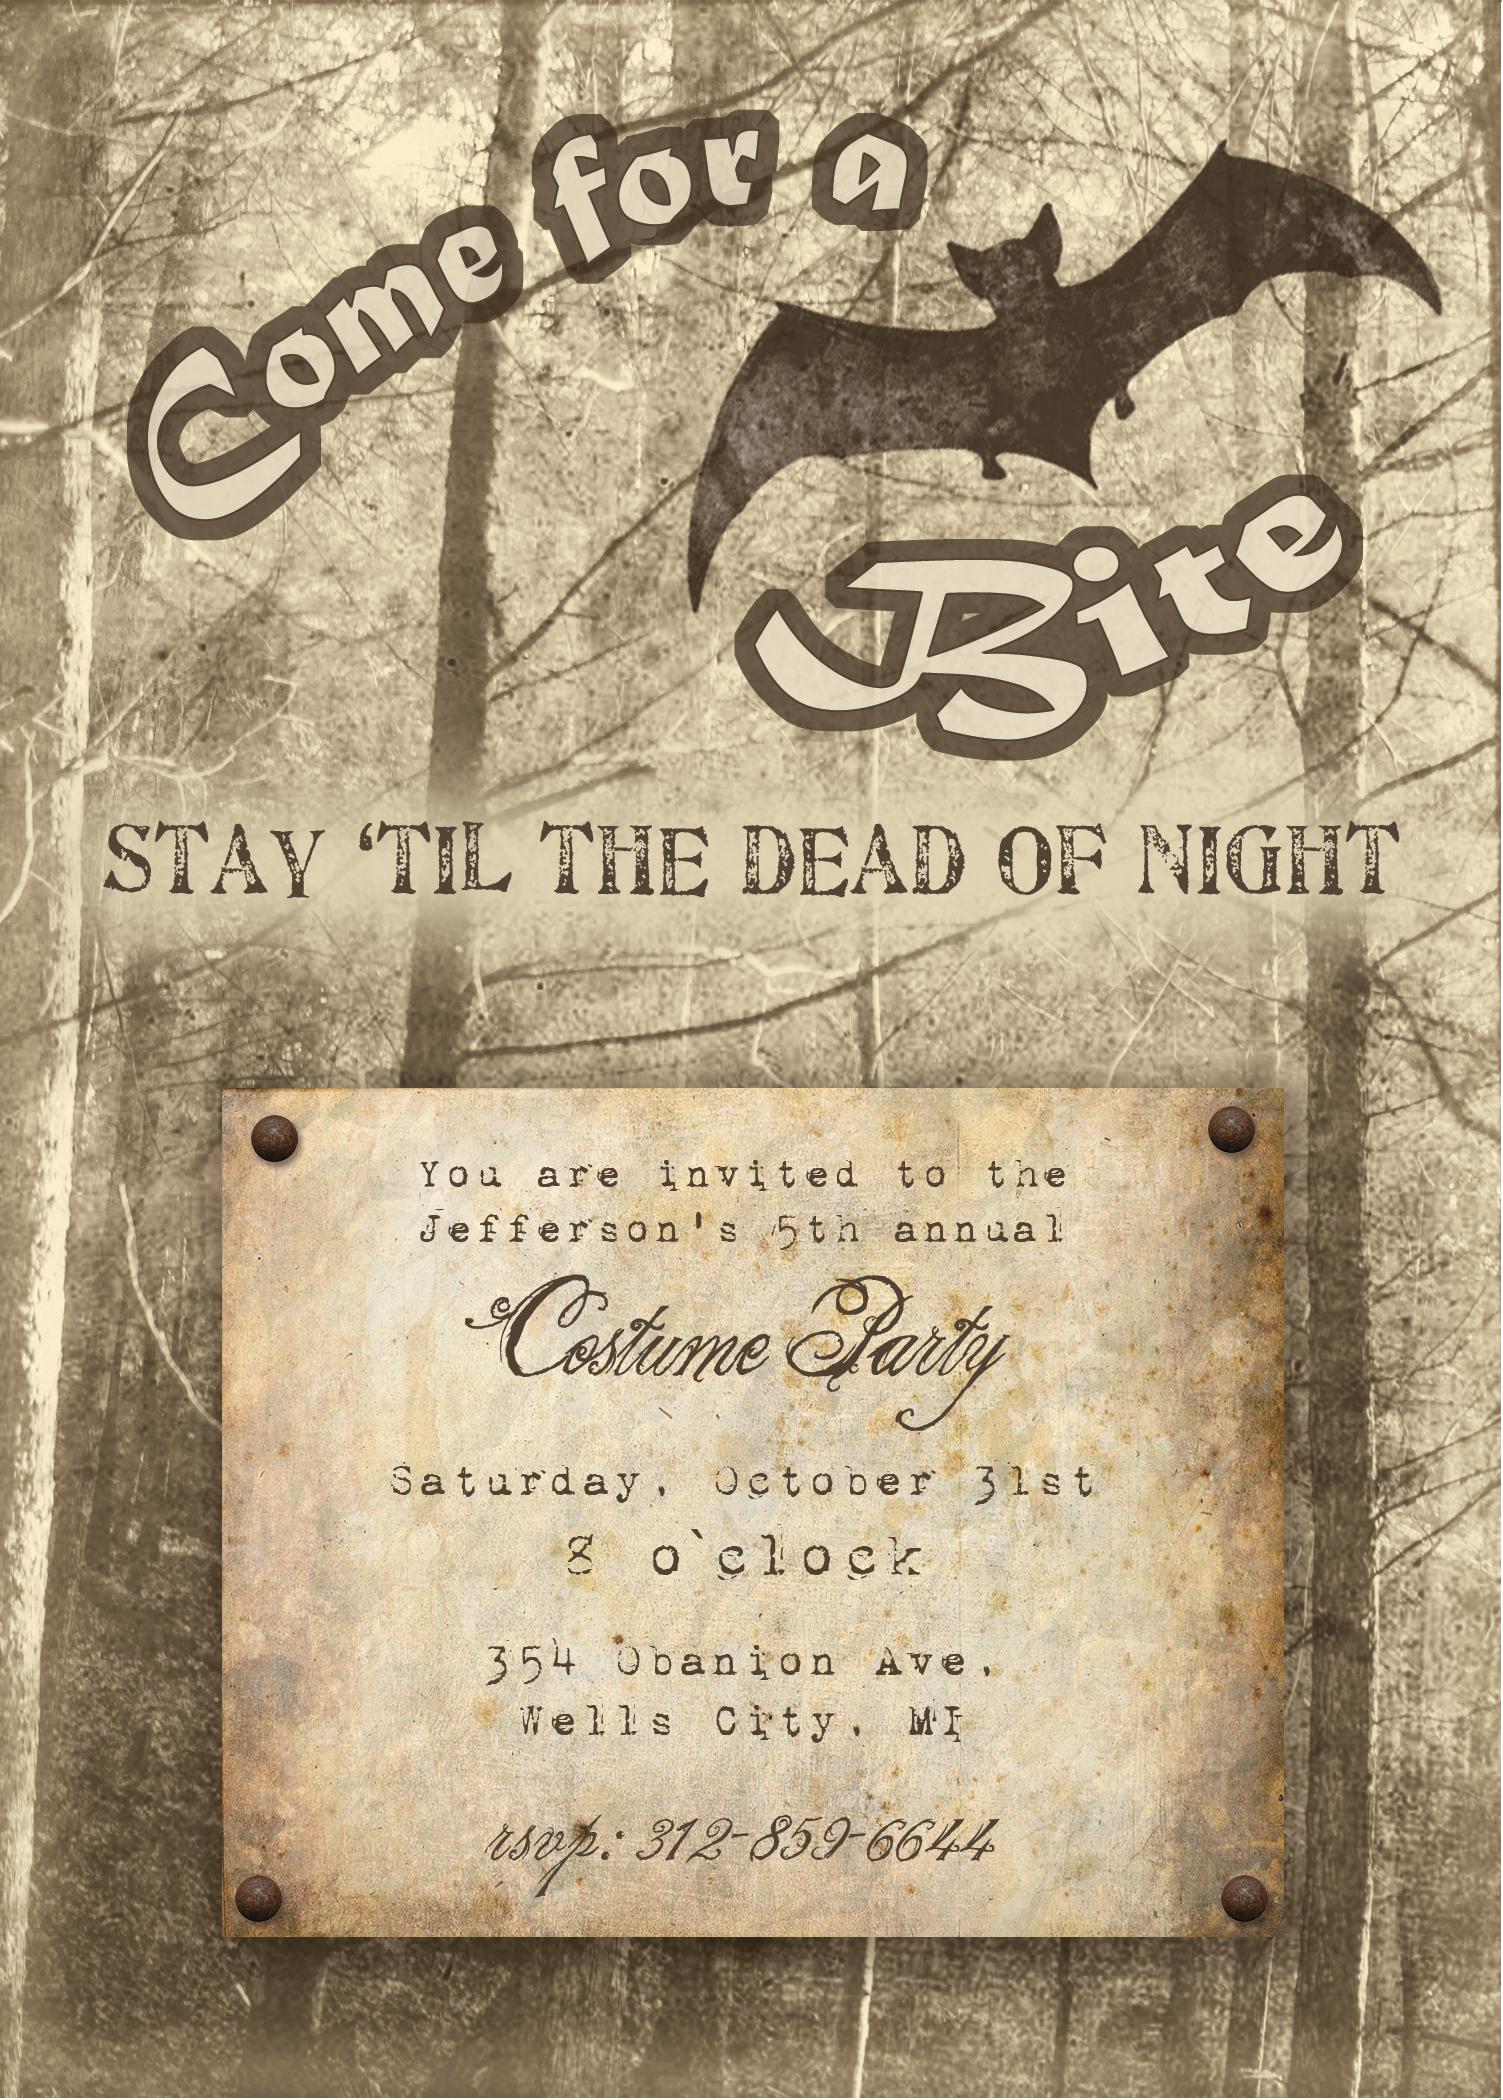 Free Printable Halloween Invitation - Free Printable Halloween Invitations For Adults